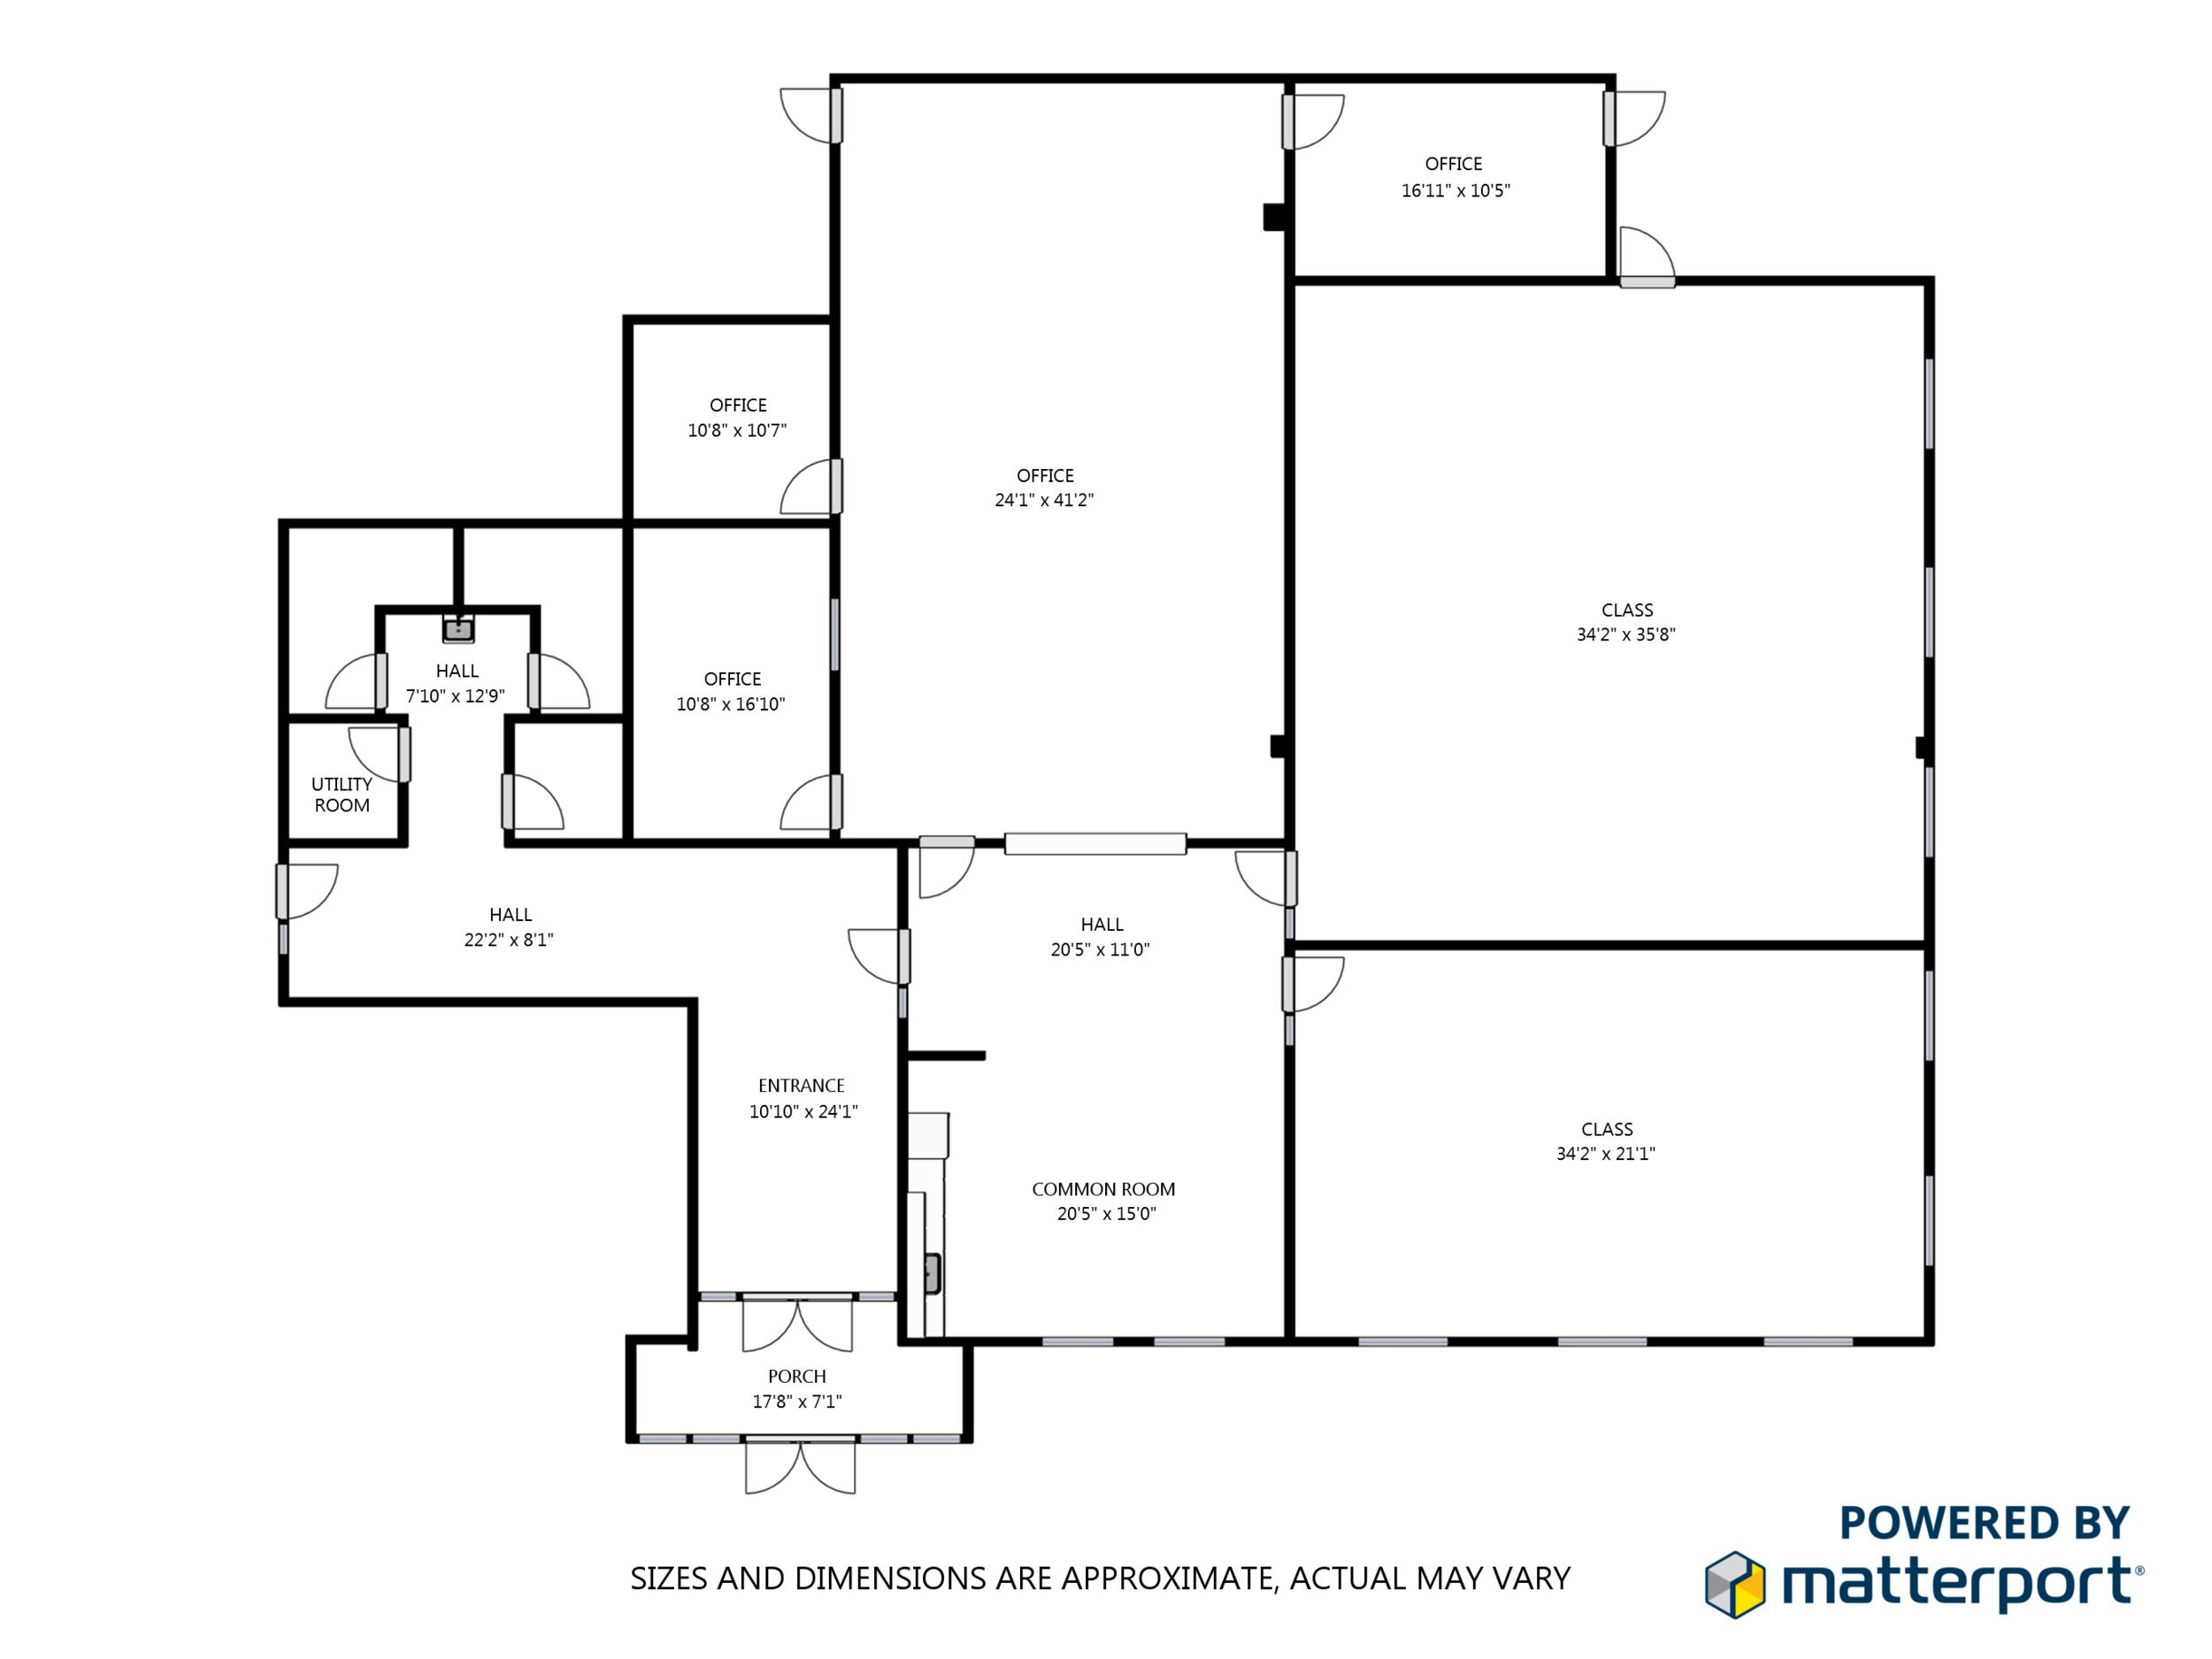 Office & Classroom - Floorplan